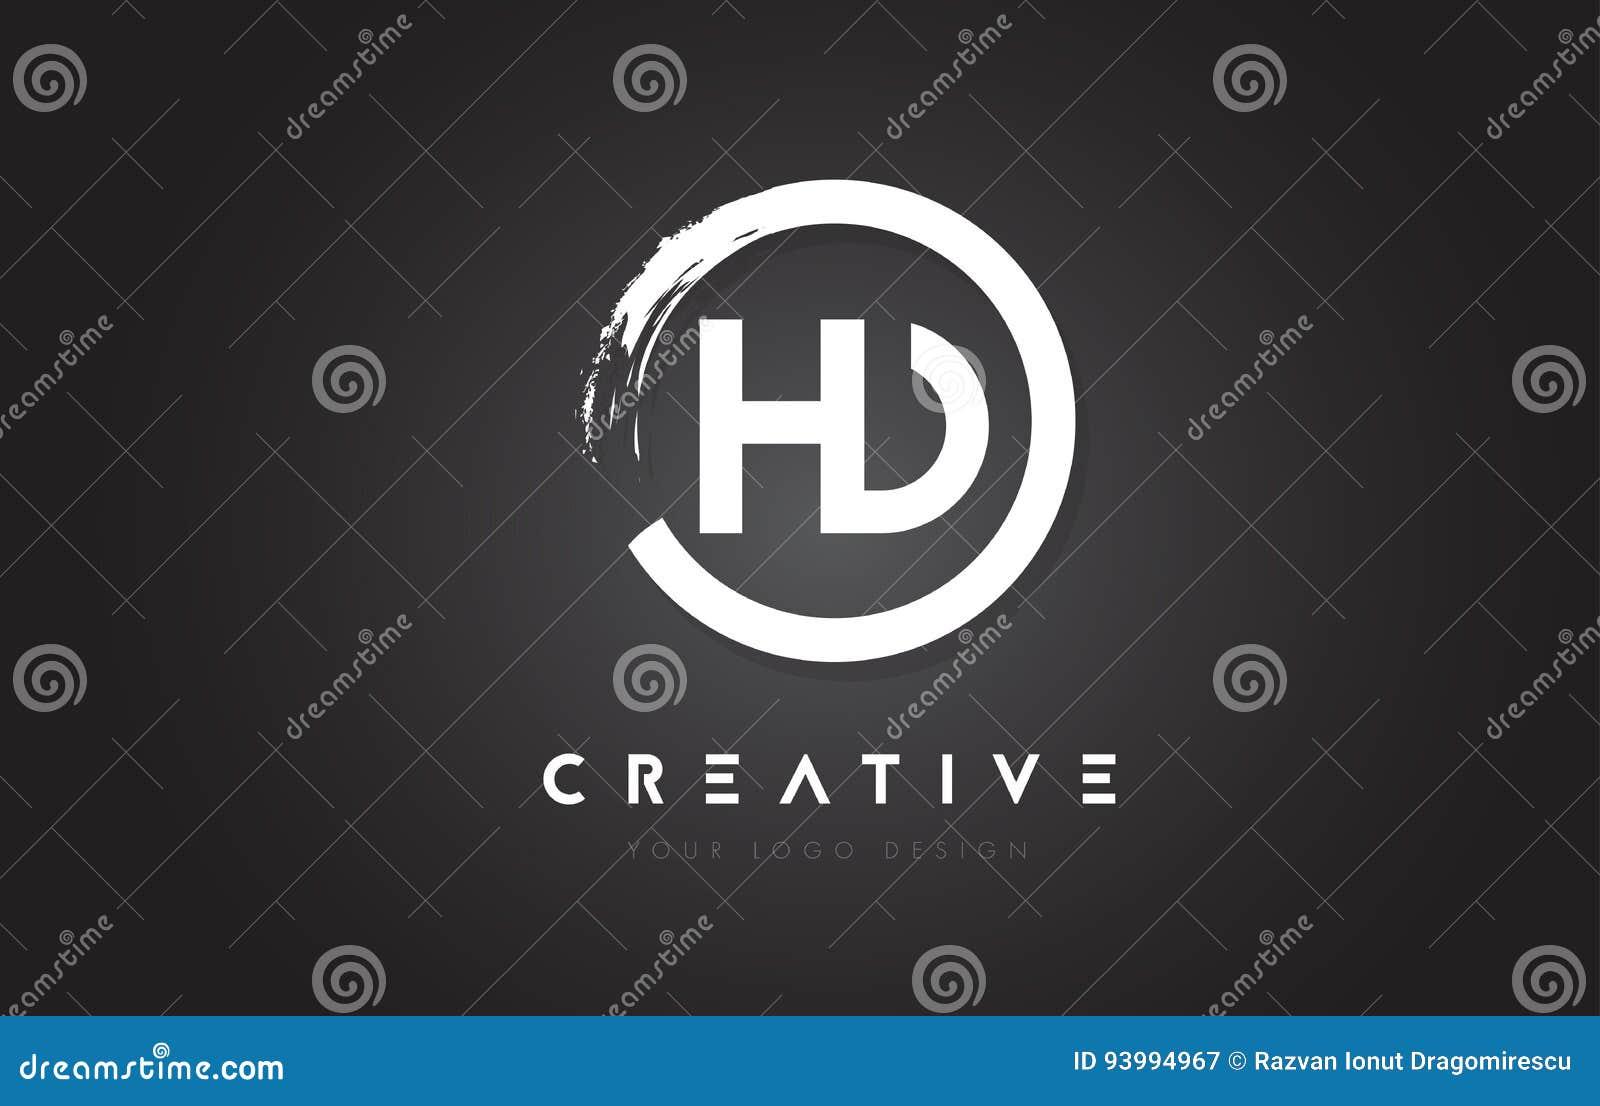 Hd Circular Letter Logo With Circle Brush Design And Black Backg